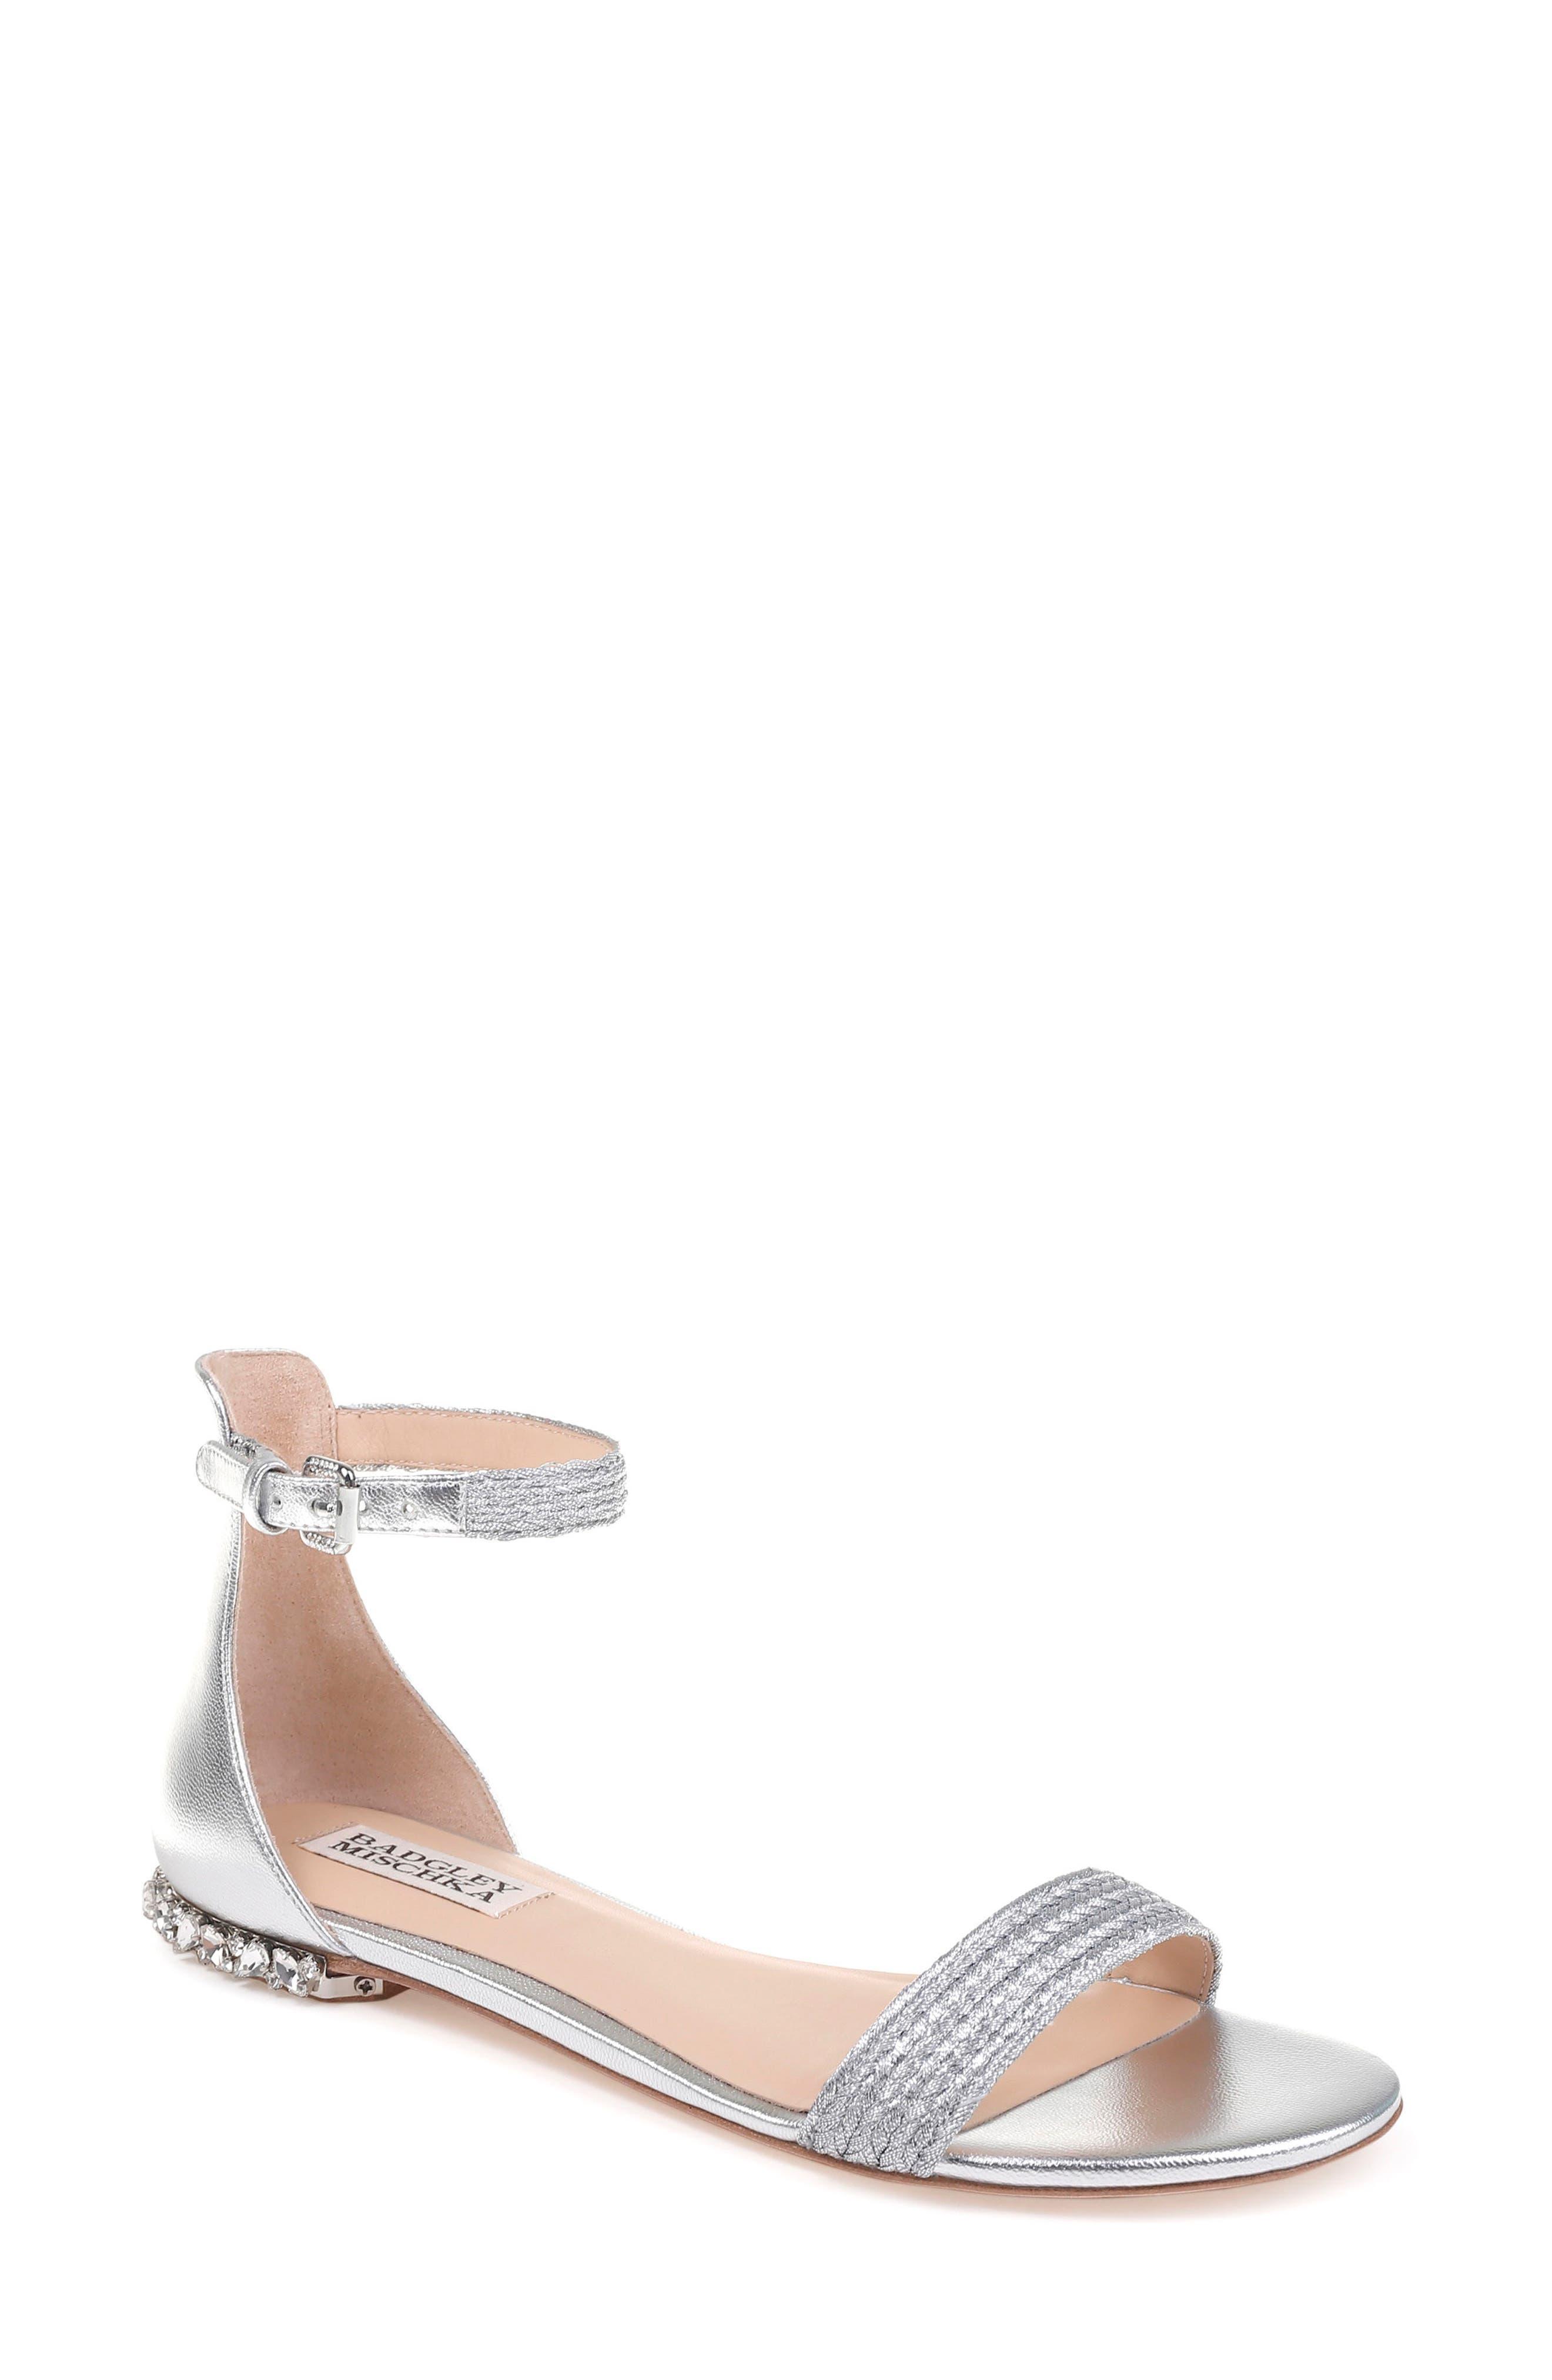 Steffie Ankle Strap Sandal,                             Main thumbnail 1, color,                             Silver Leather